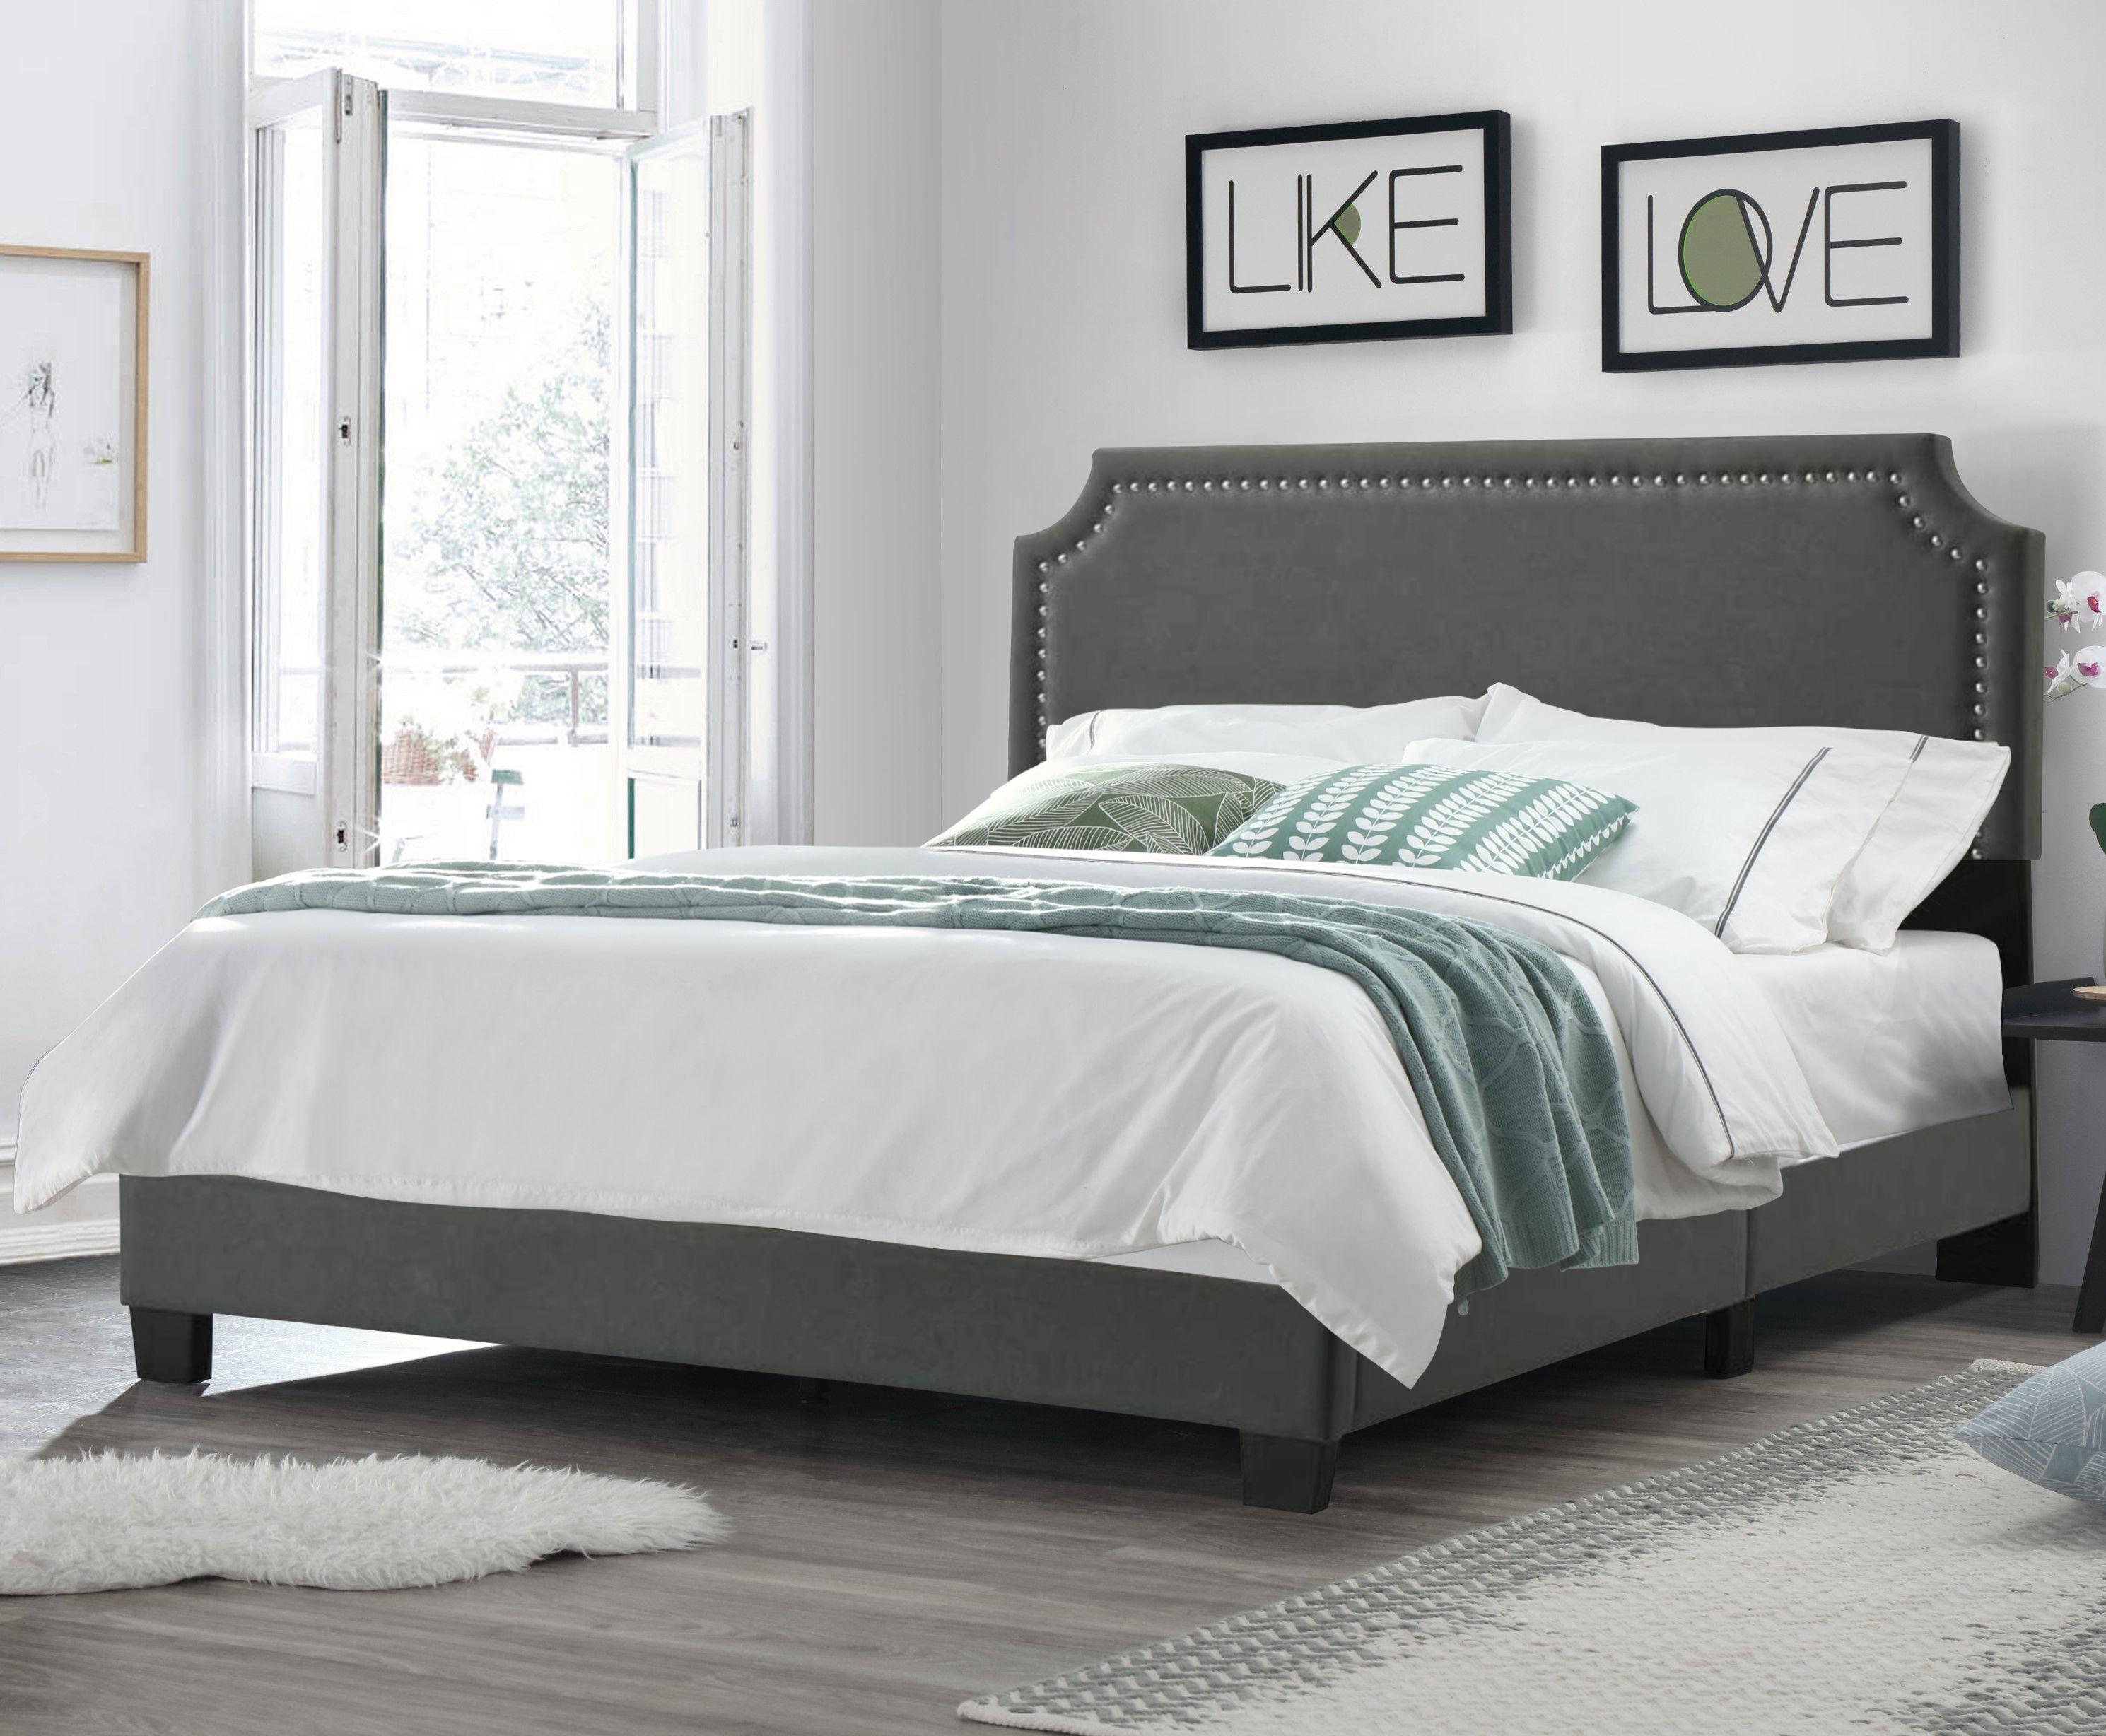 Regal Upholstered Bed With Nail Trim Headboard King Walmart Com Walmart Com